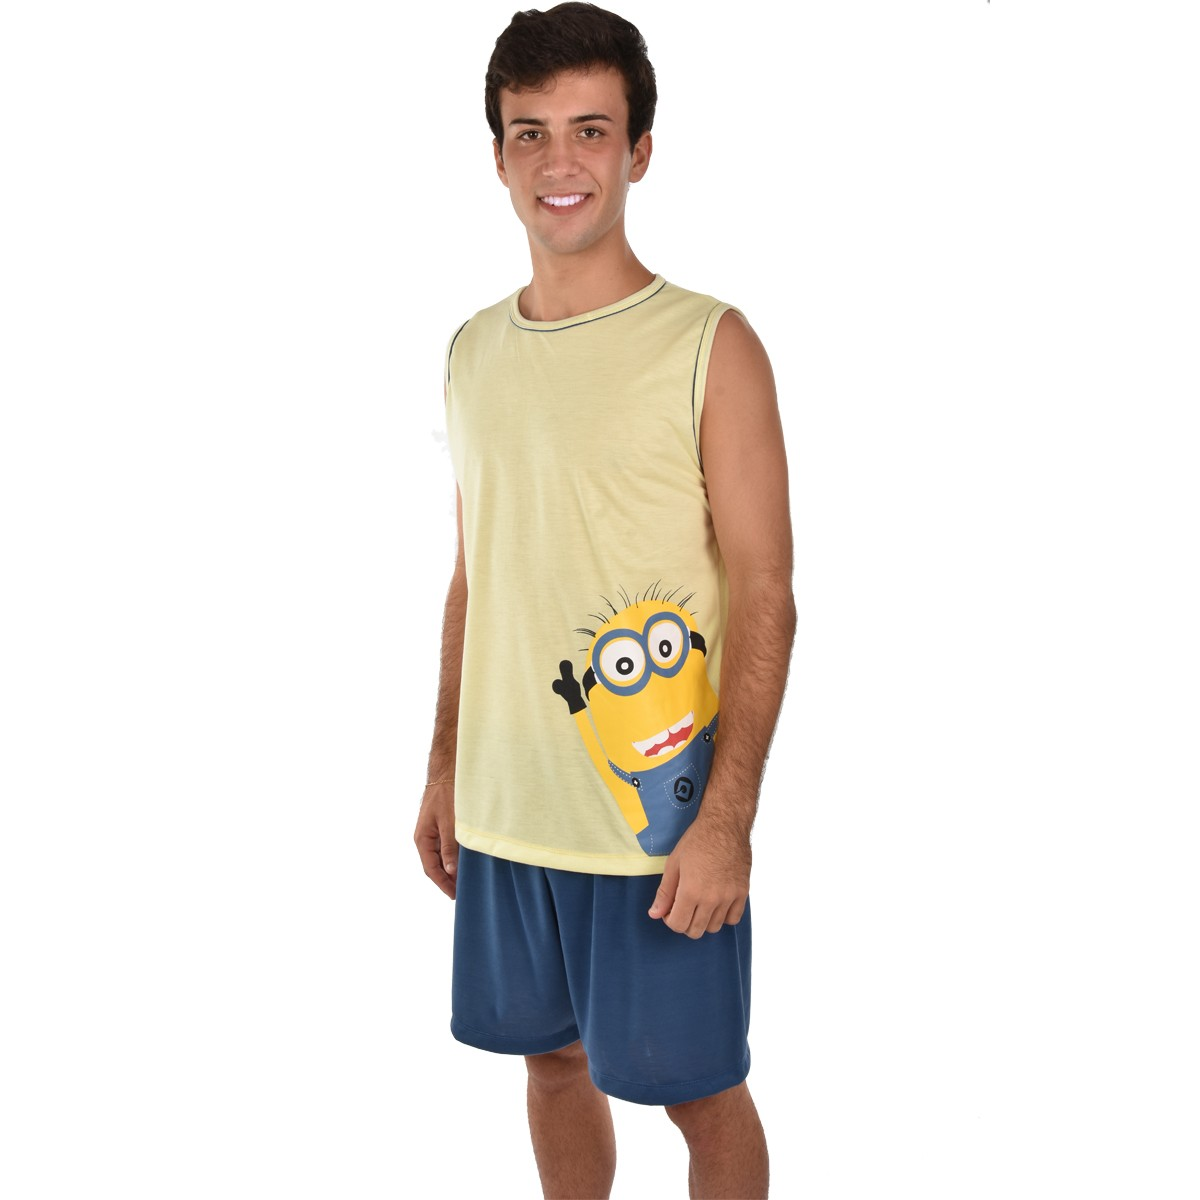 Pijama Regata Short Masculino Adulto Pai Meu Malvado Favorito Minions Ref: 326